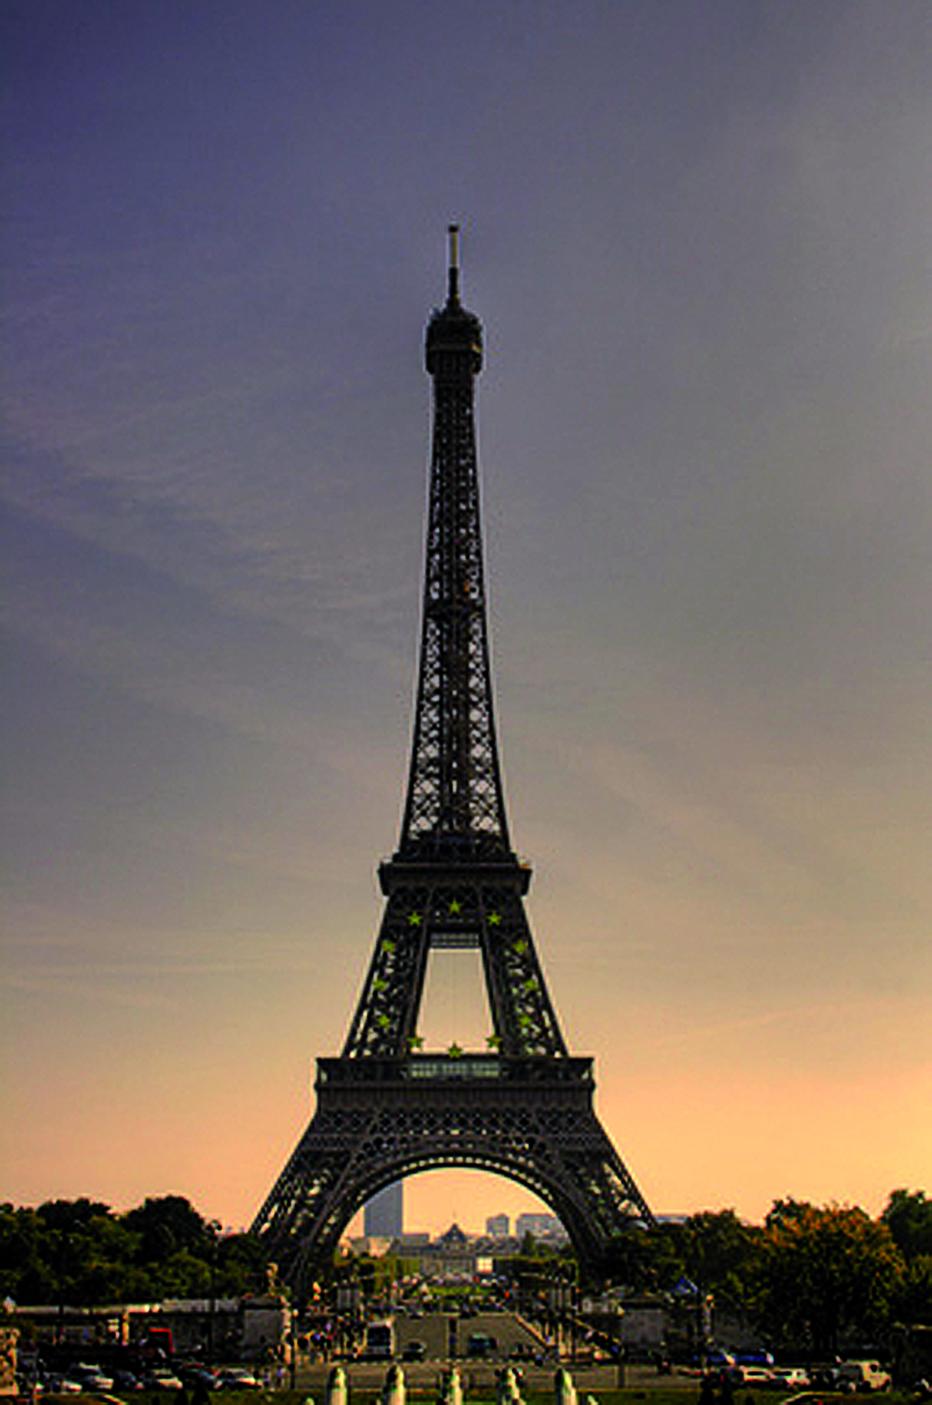 Volo Piu Hotel Per Parigi